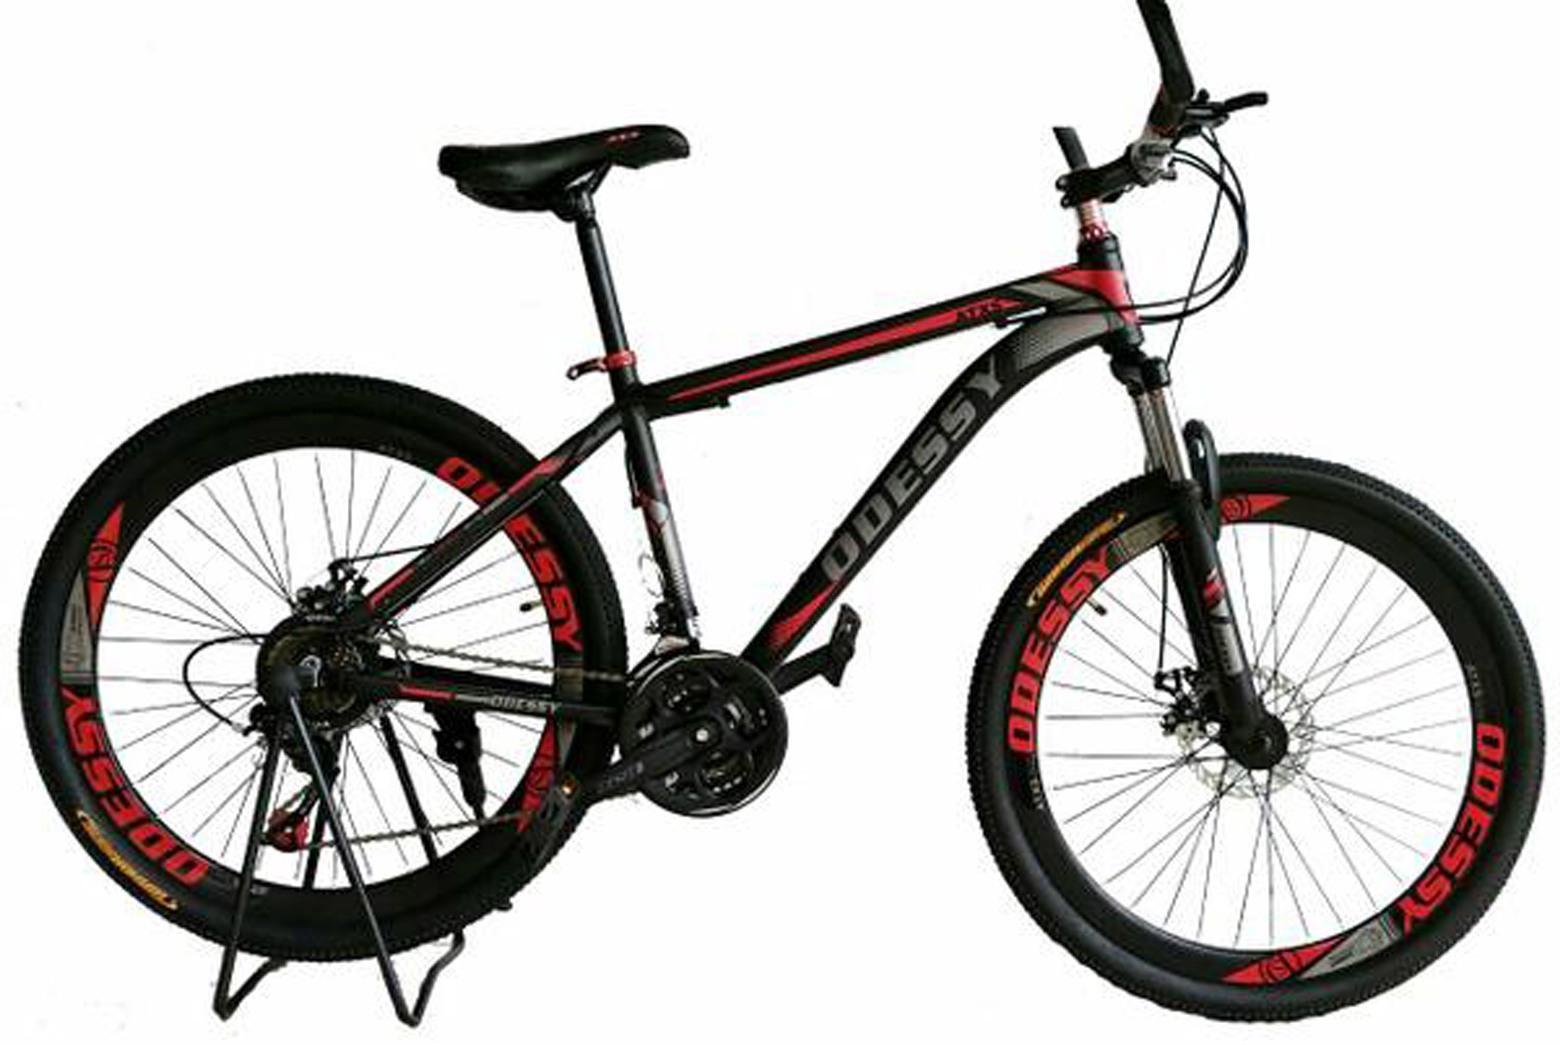 Odessy Atxs 500 MTB Alloy Sporty Sepeda Gunung MTB 26  -  (KHUSUS PULAU JAWA)